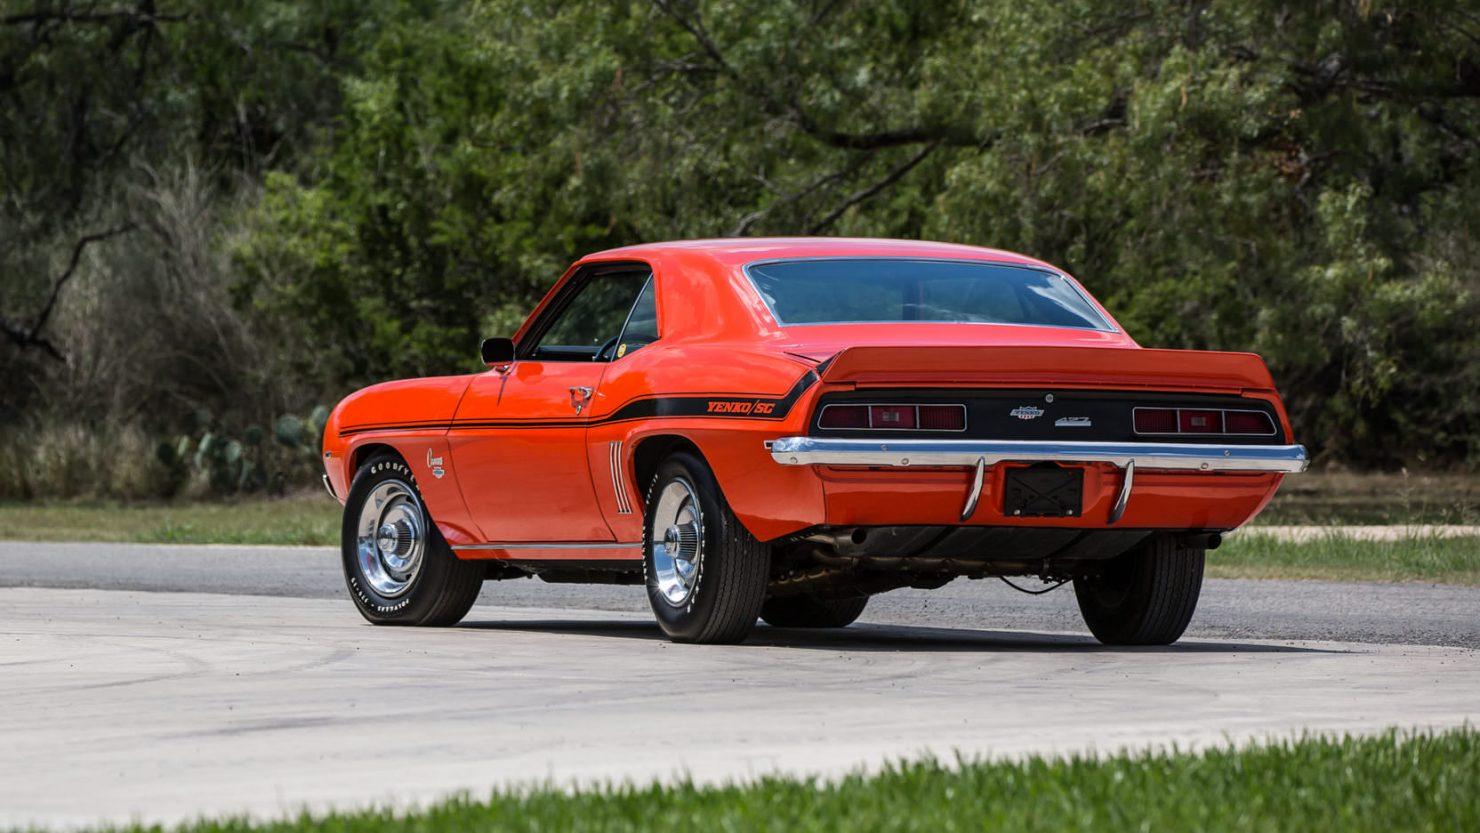 Copo Camaro For Sale >> 1969 Chevrolet Yenko Camaro